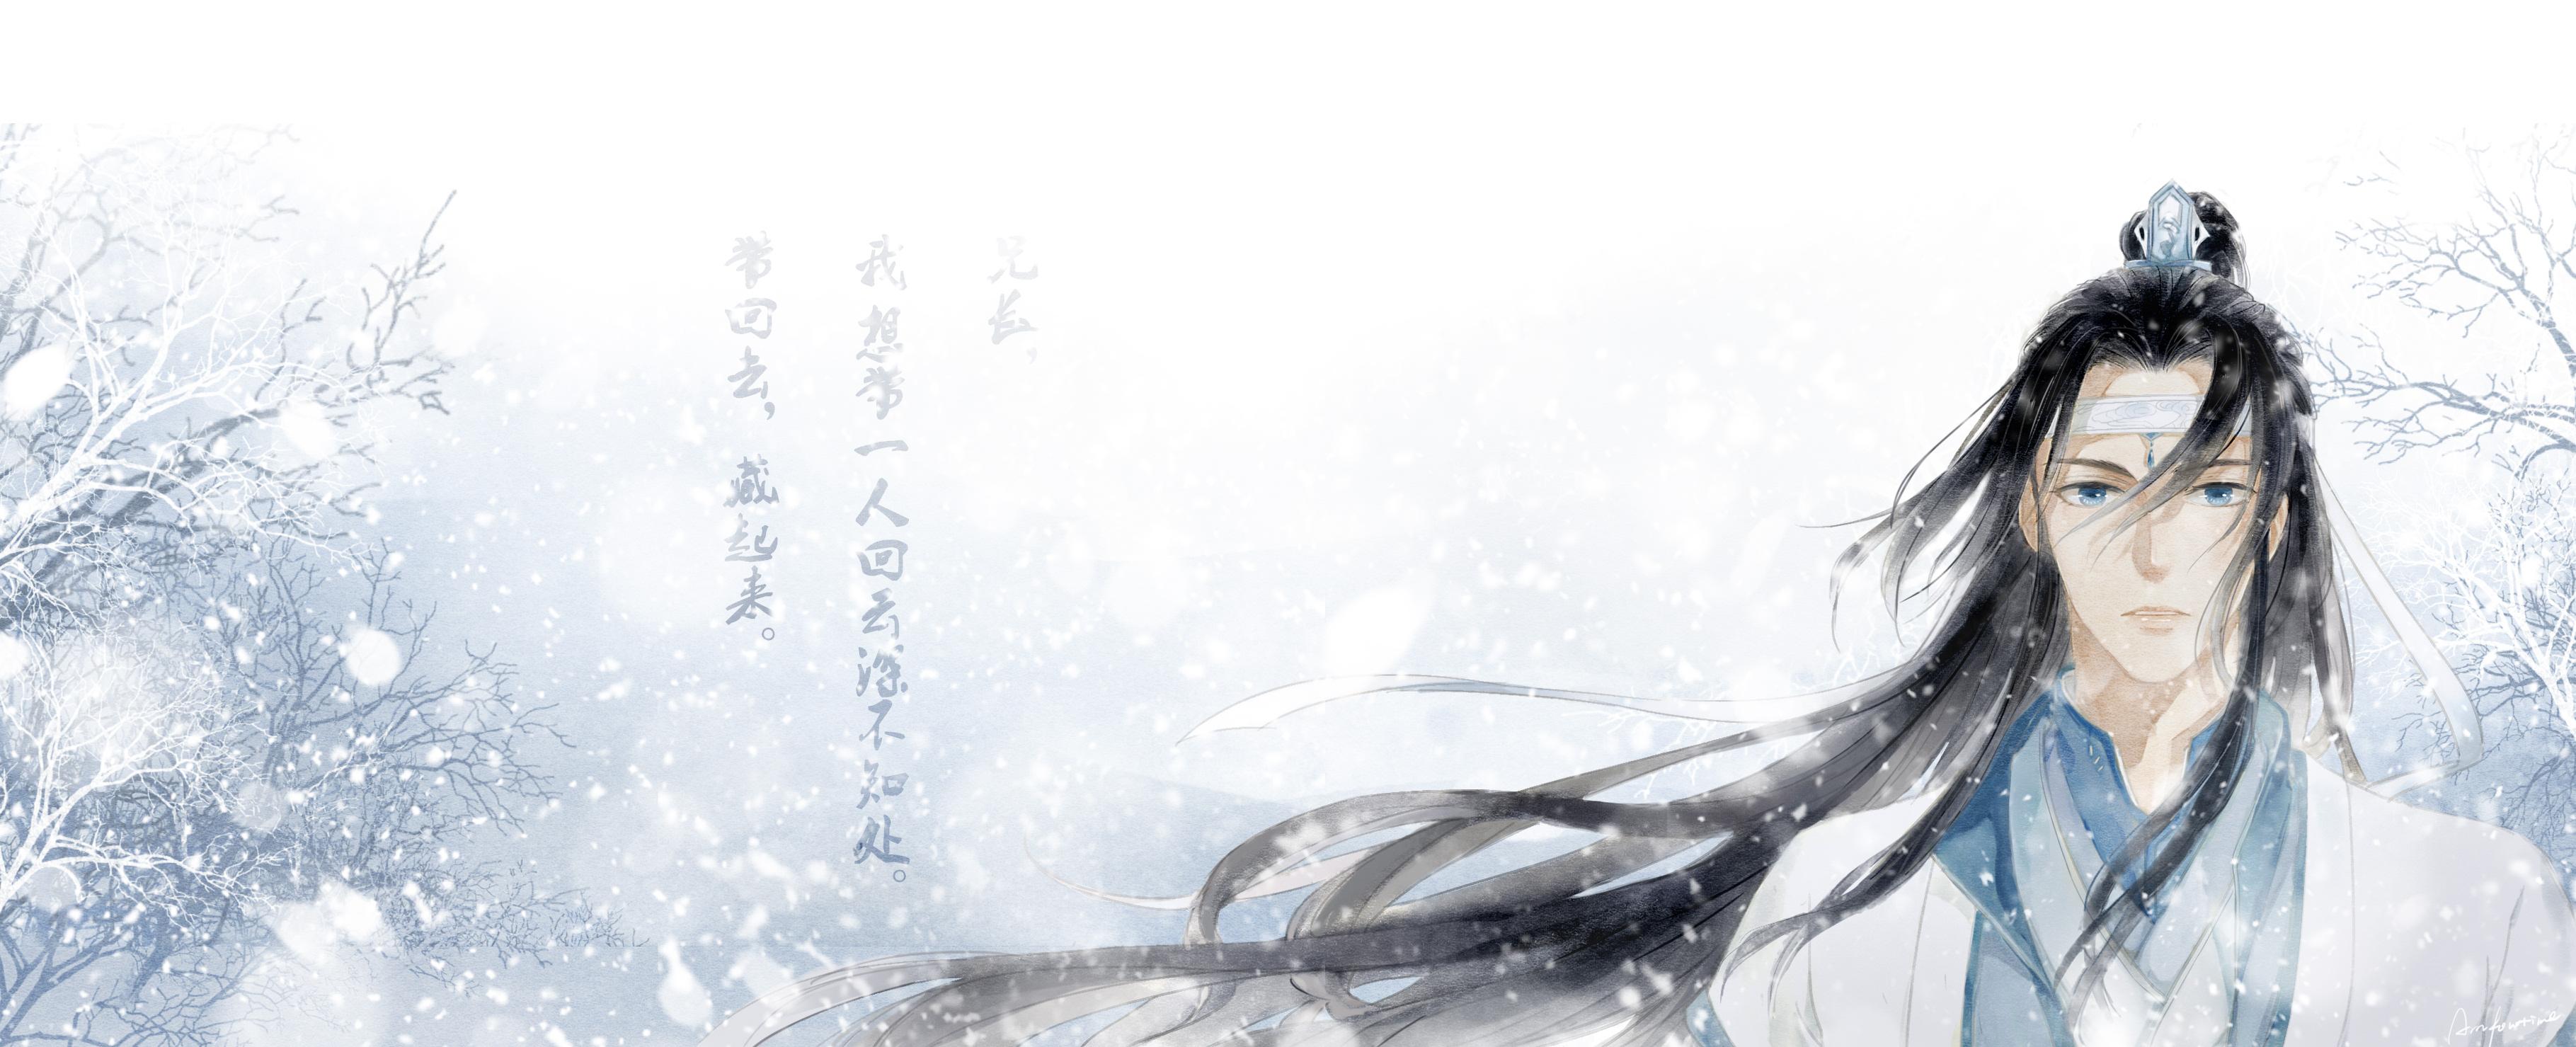 Lan Zhan Hd Wallpaper Background Image 3639x1479 Id 995757